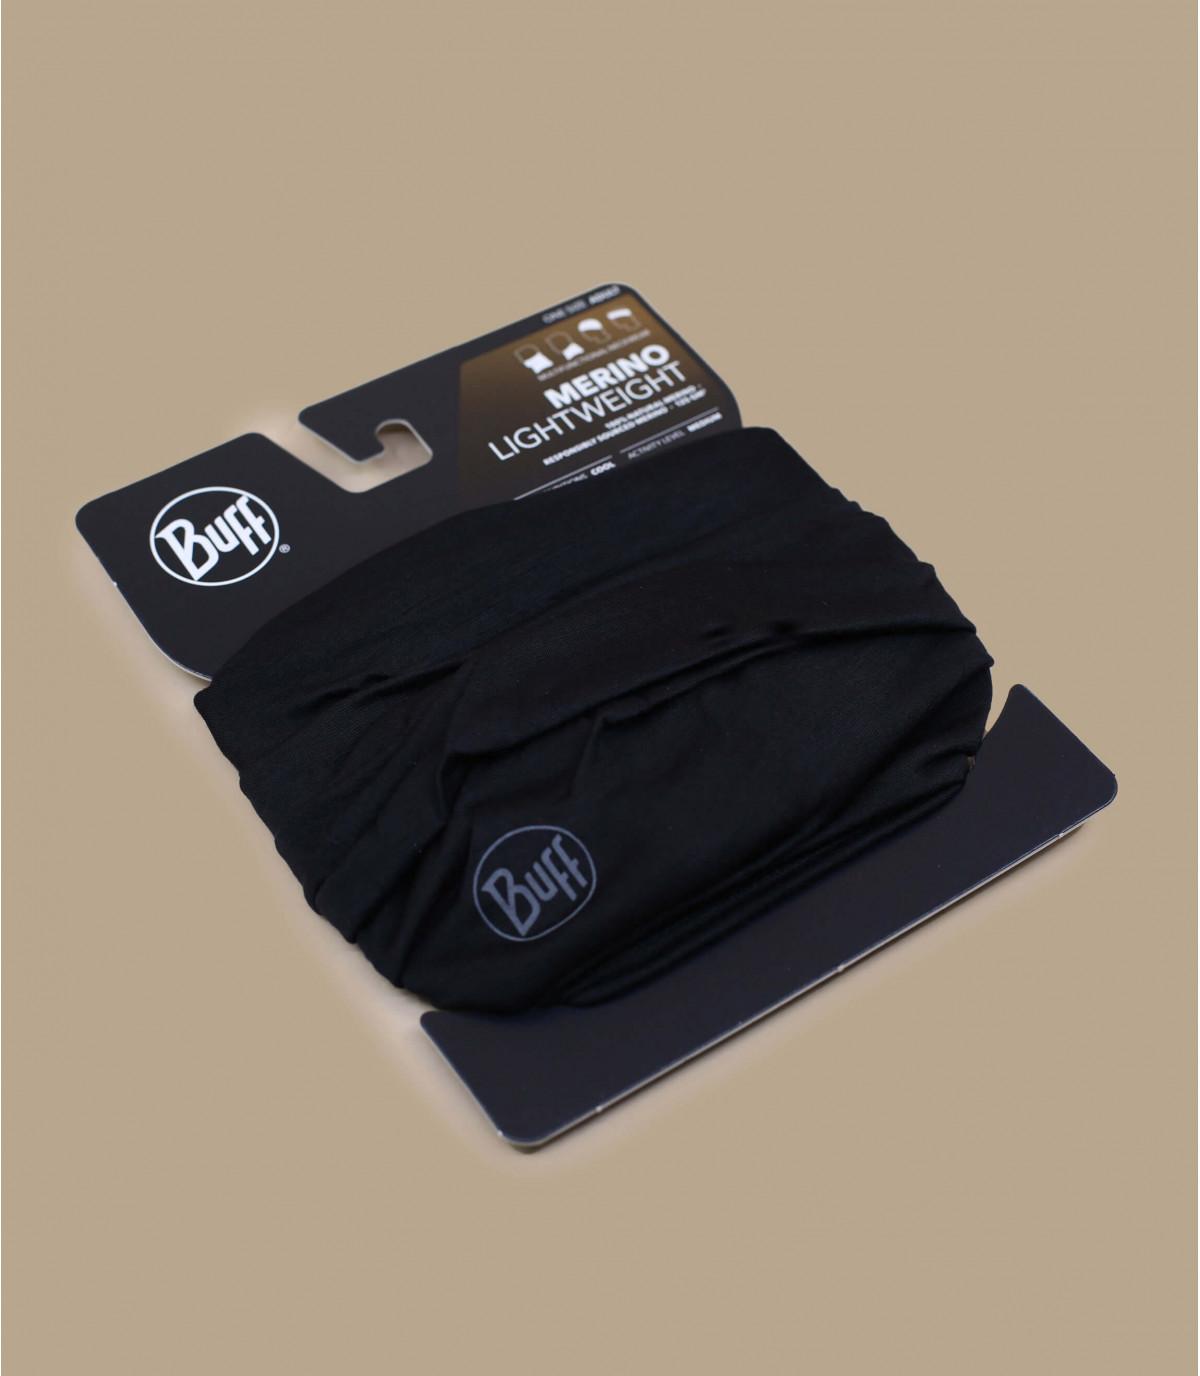 Details Lightweight Merino Wool solid black - Abbildung 2